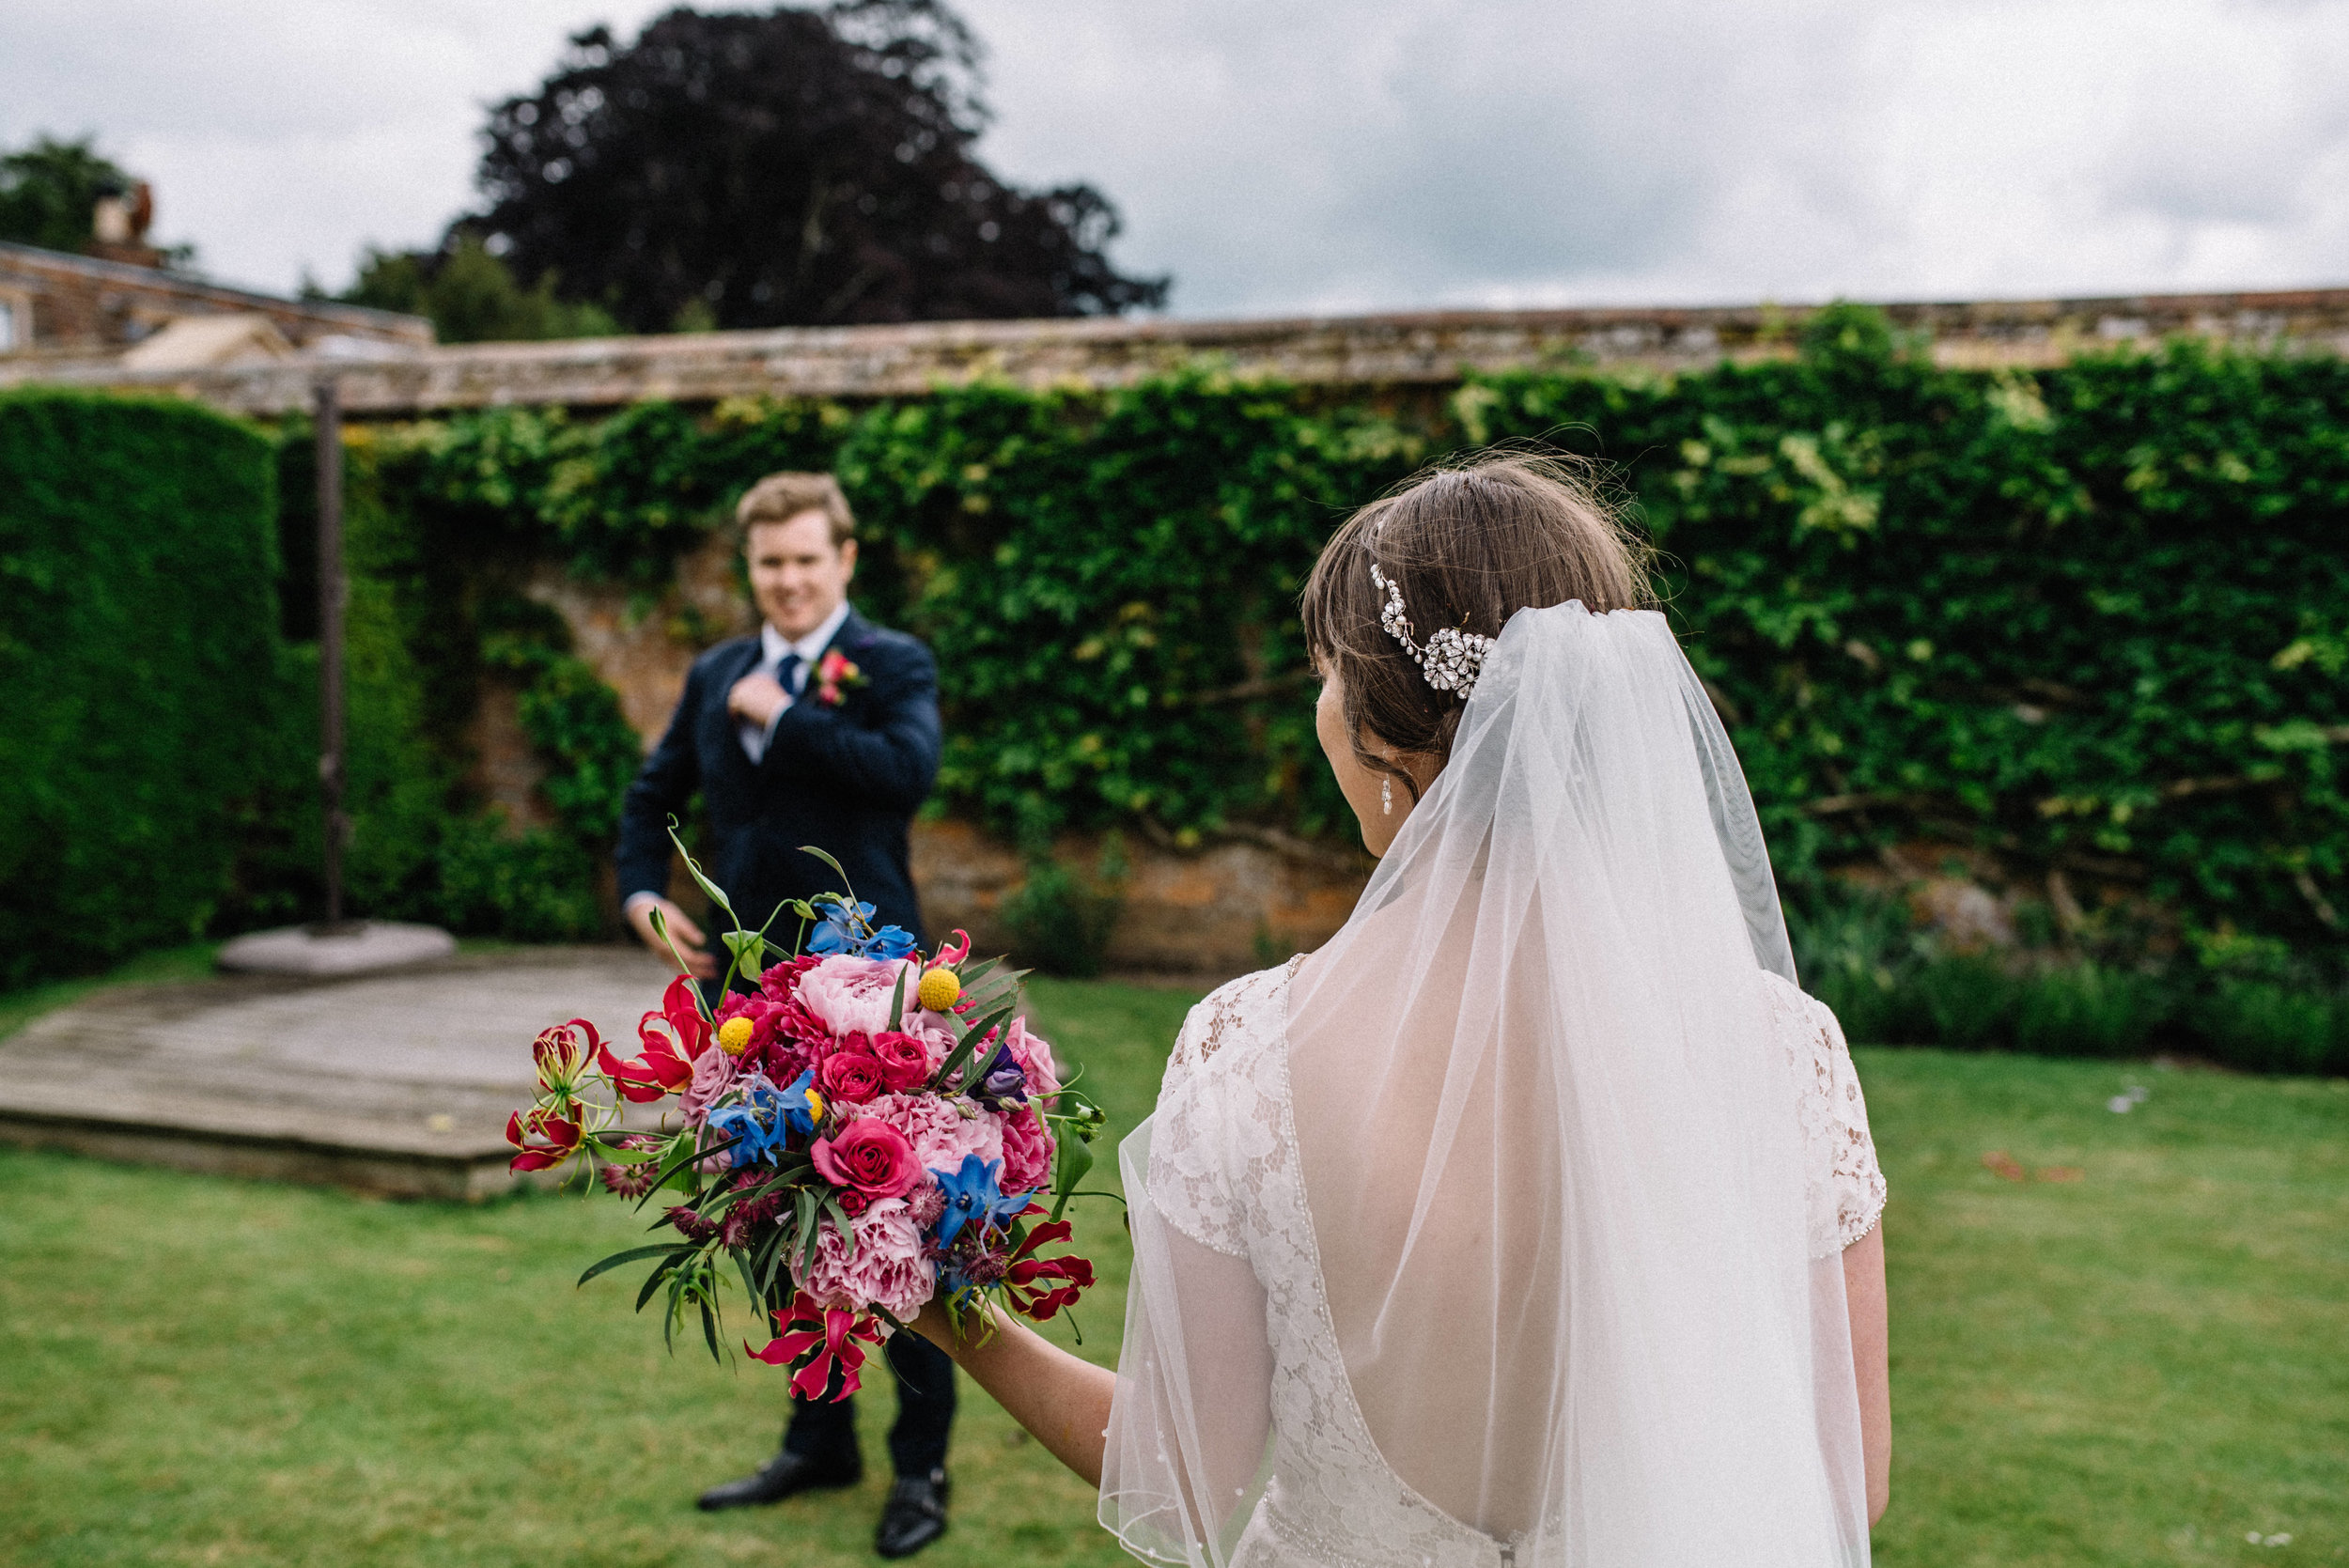 North Cadbury Court Wedding Photographer-40.jpg